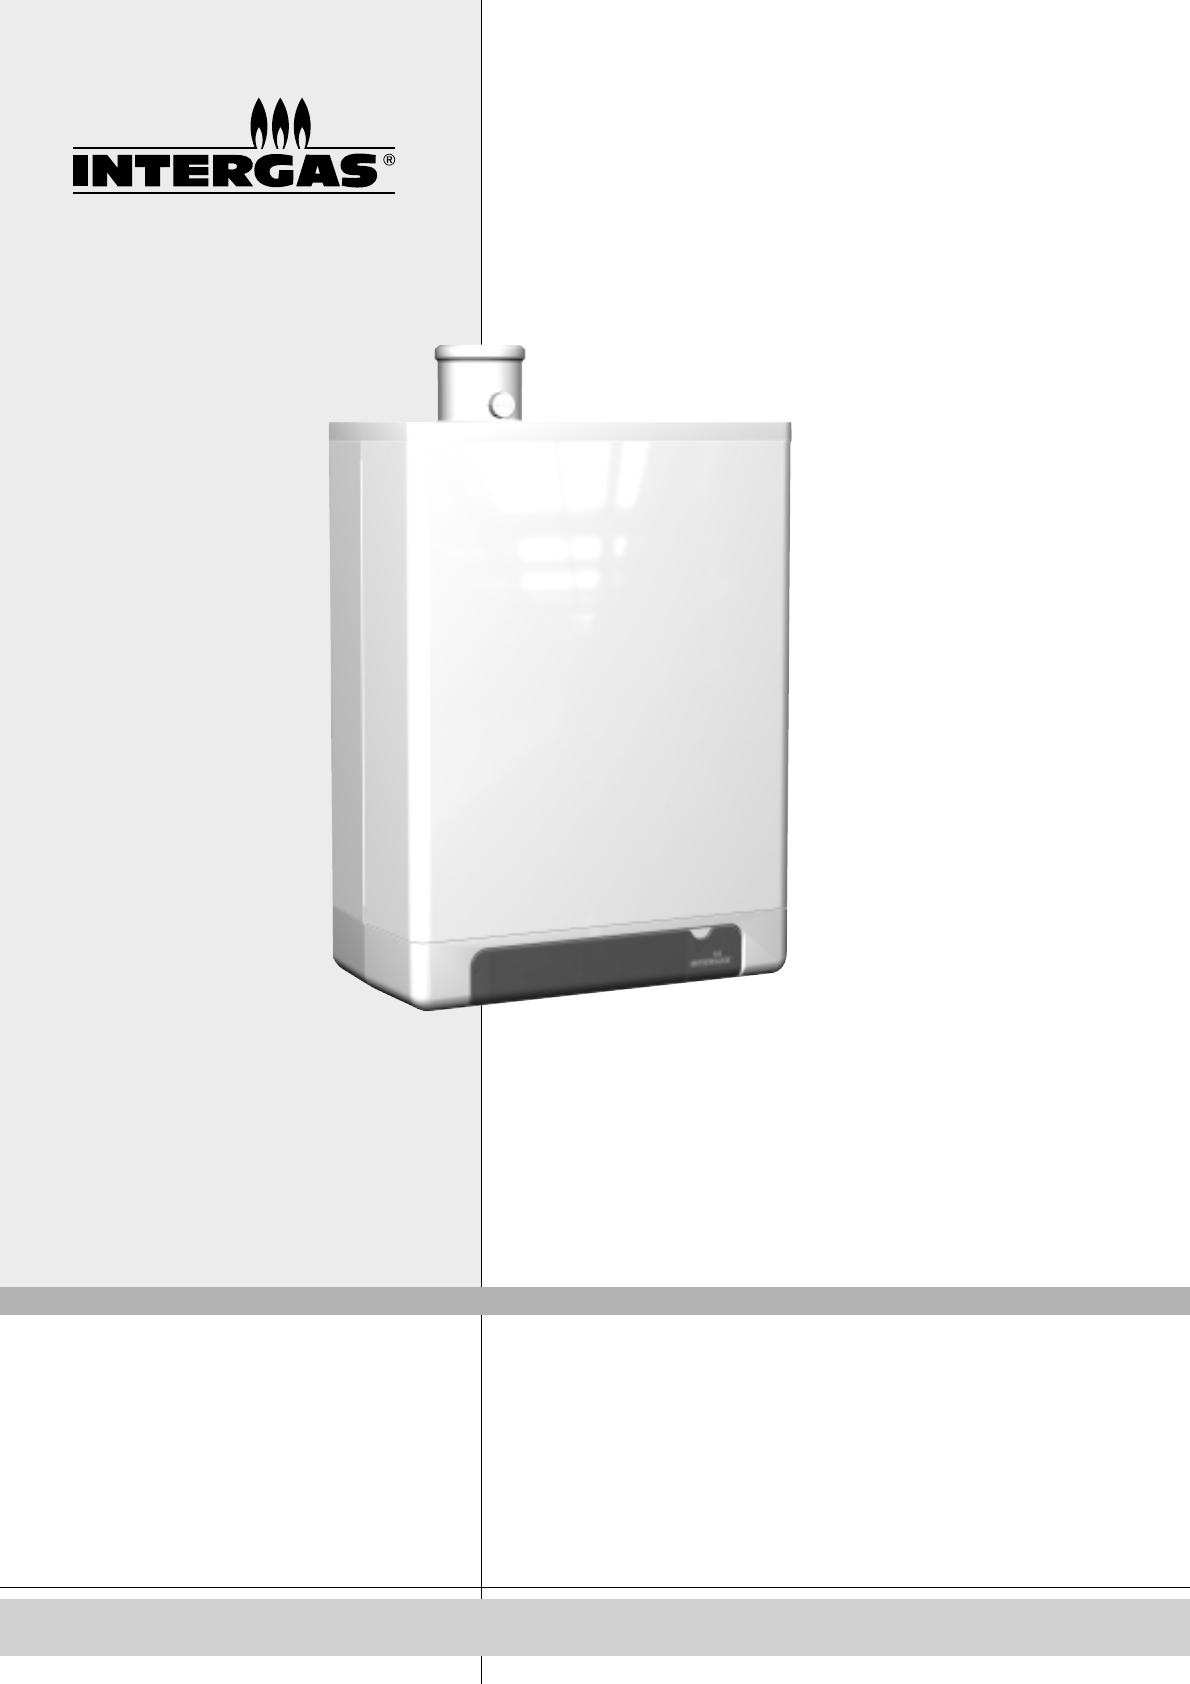 Intergas Kompakt Hr.Handleiding Intergas Hr 36 30 Kombi Kompact Pagina 1 Van 48